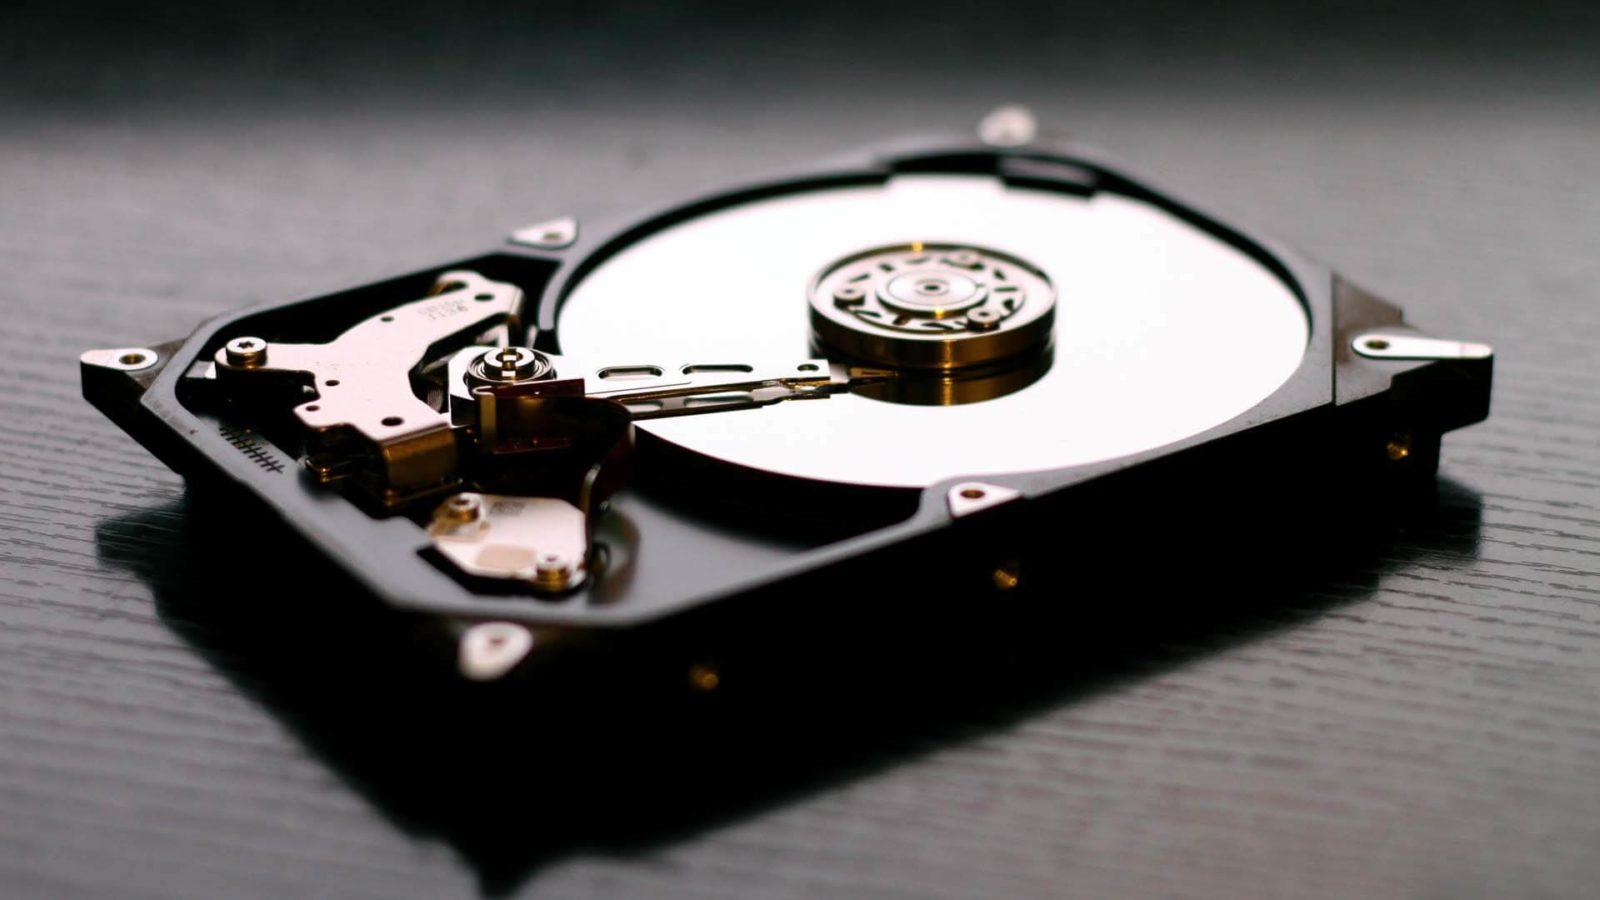 Майнинг на жестком диске